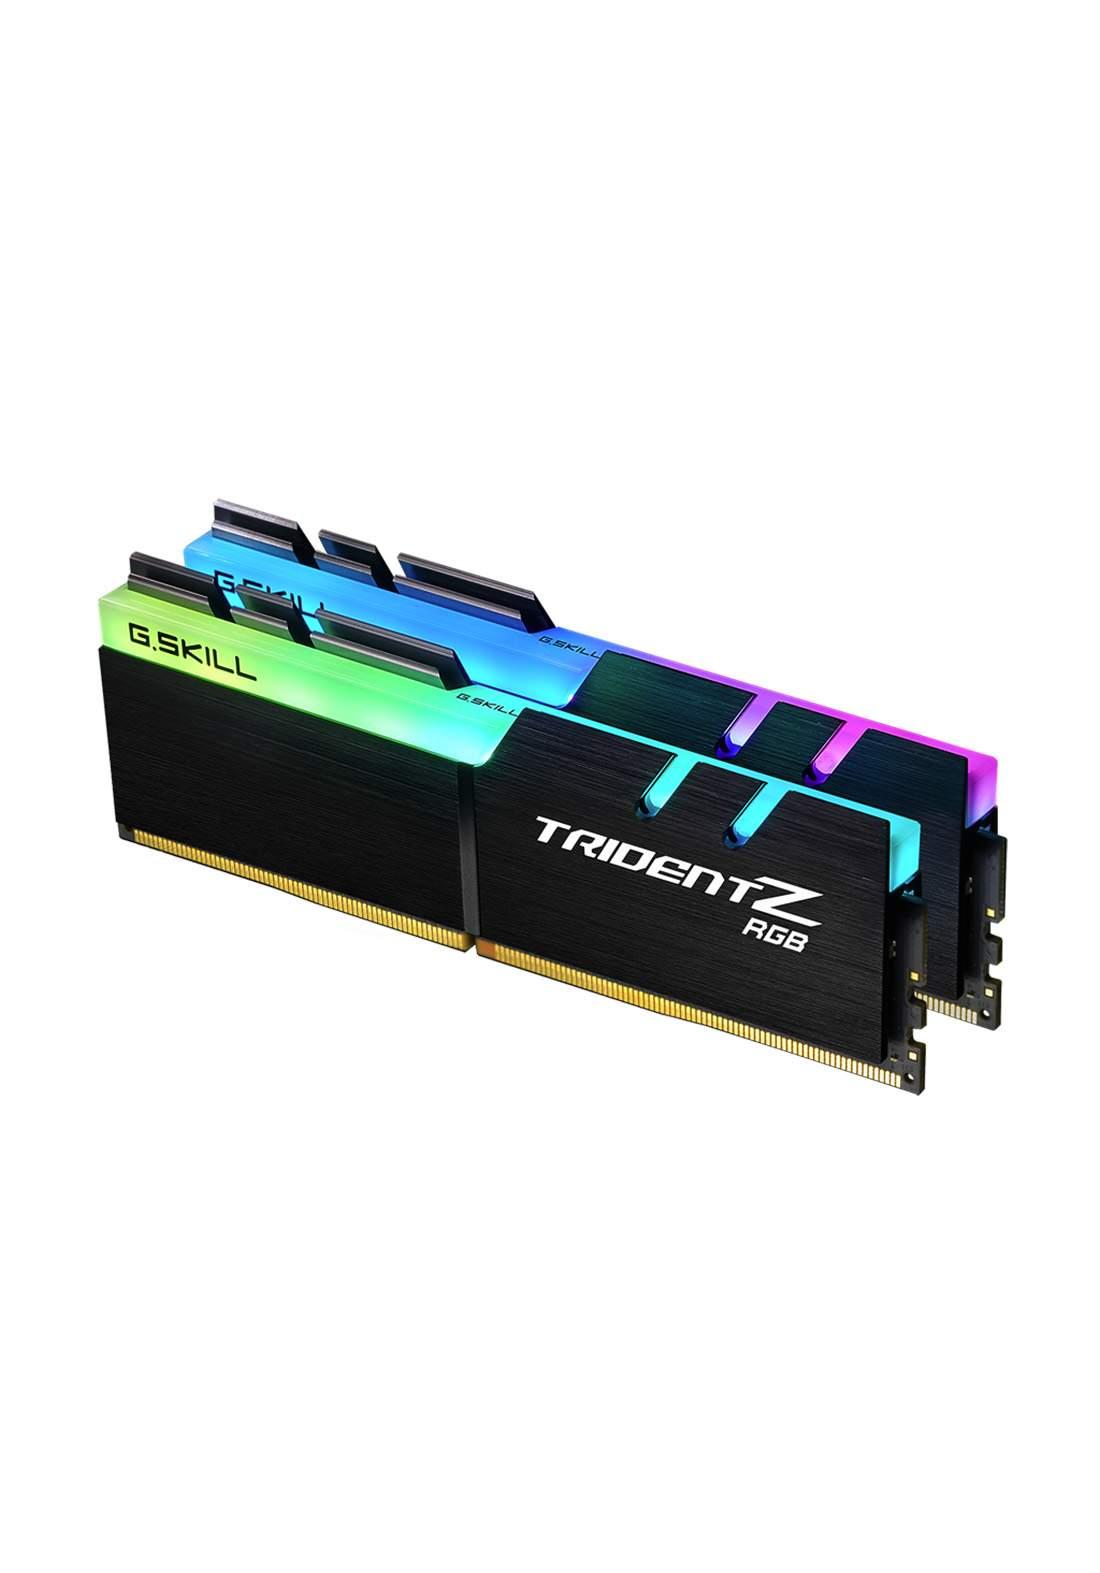 G.SKILL TridentZ RGB 16GB (2 x 8GB) DDR4 3000 Mhz Desktop Memory هارد